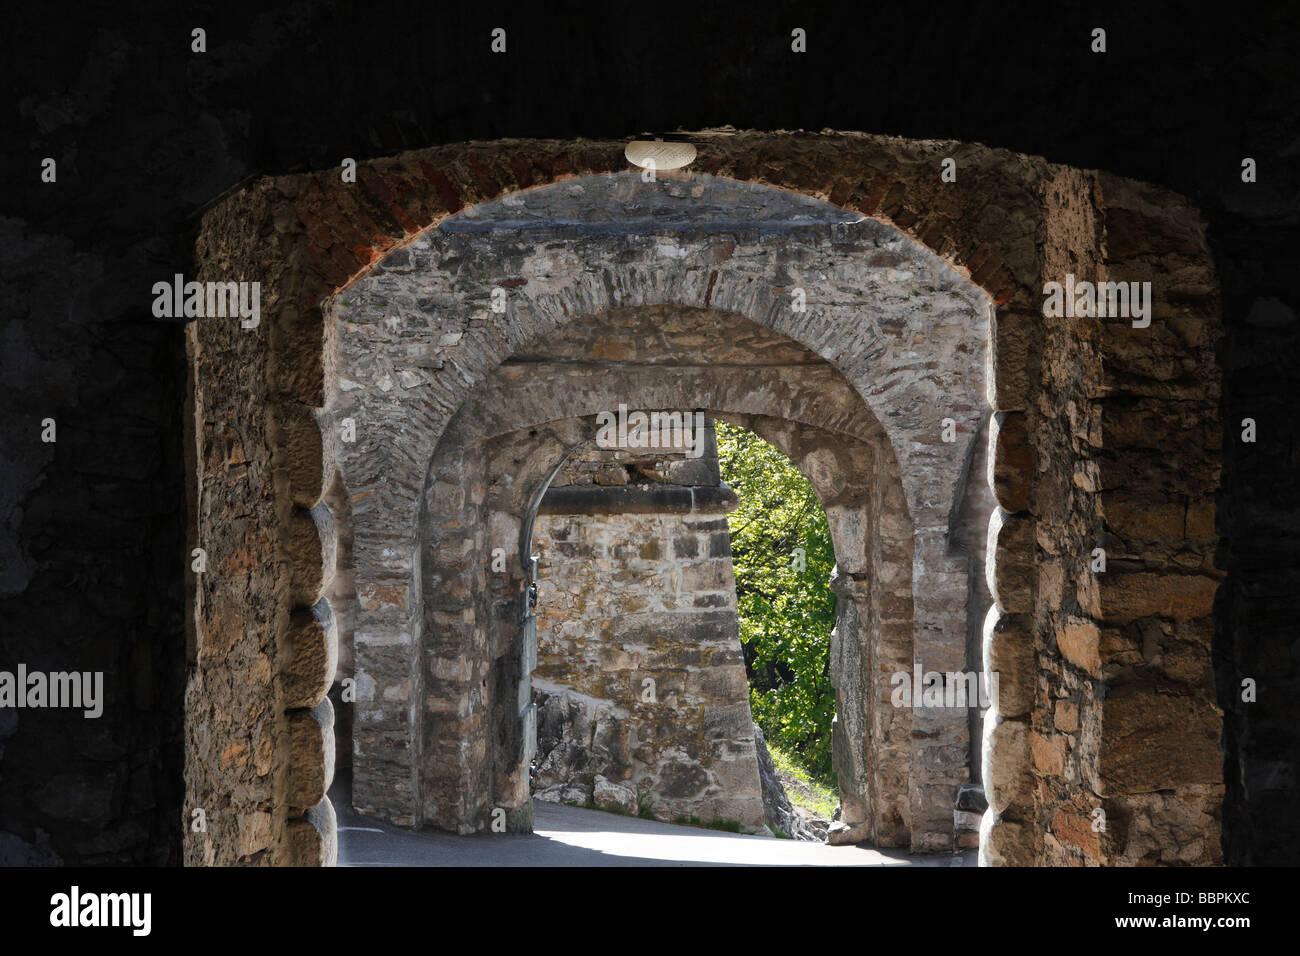 Castle gates, castle ruins Landskron near Villach, Carinthia, Austria, Europe Stock Photo